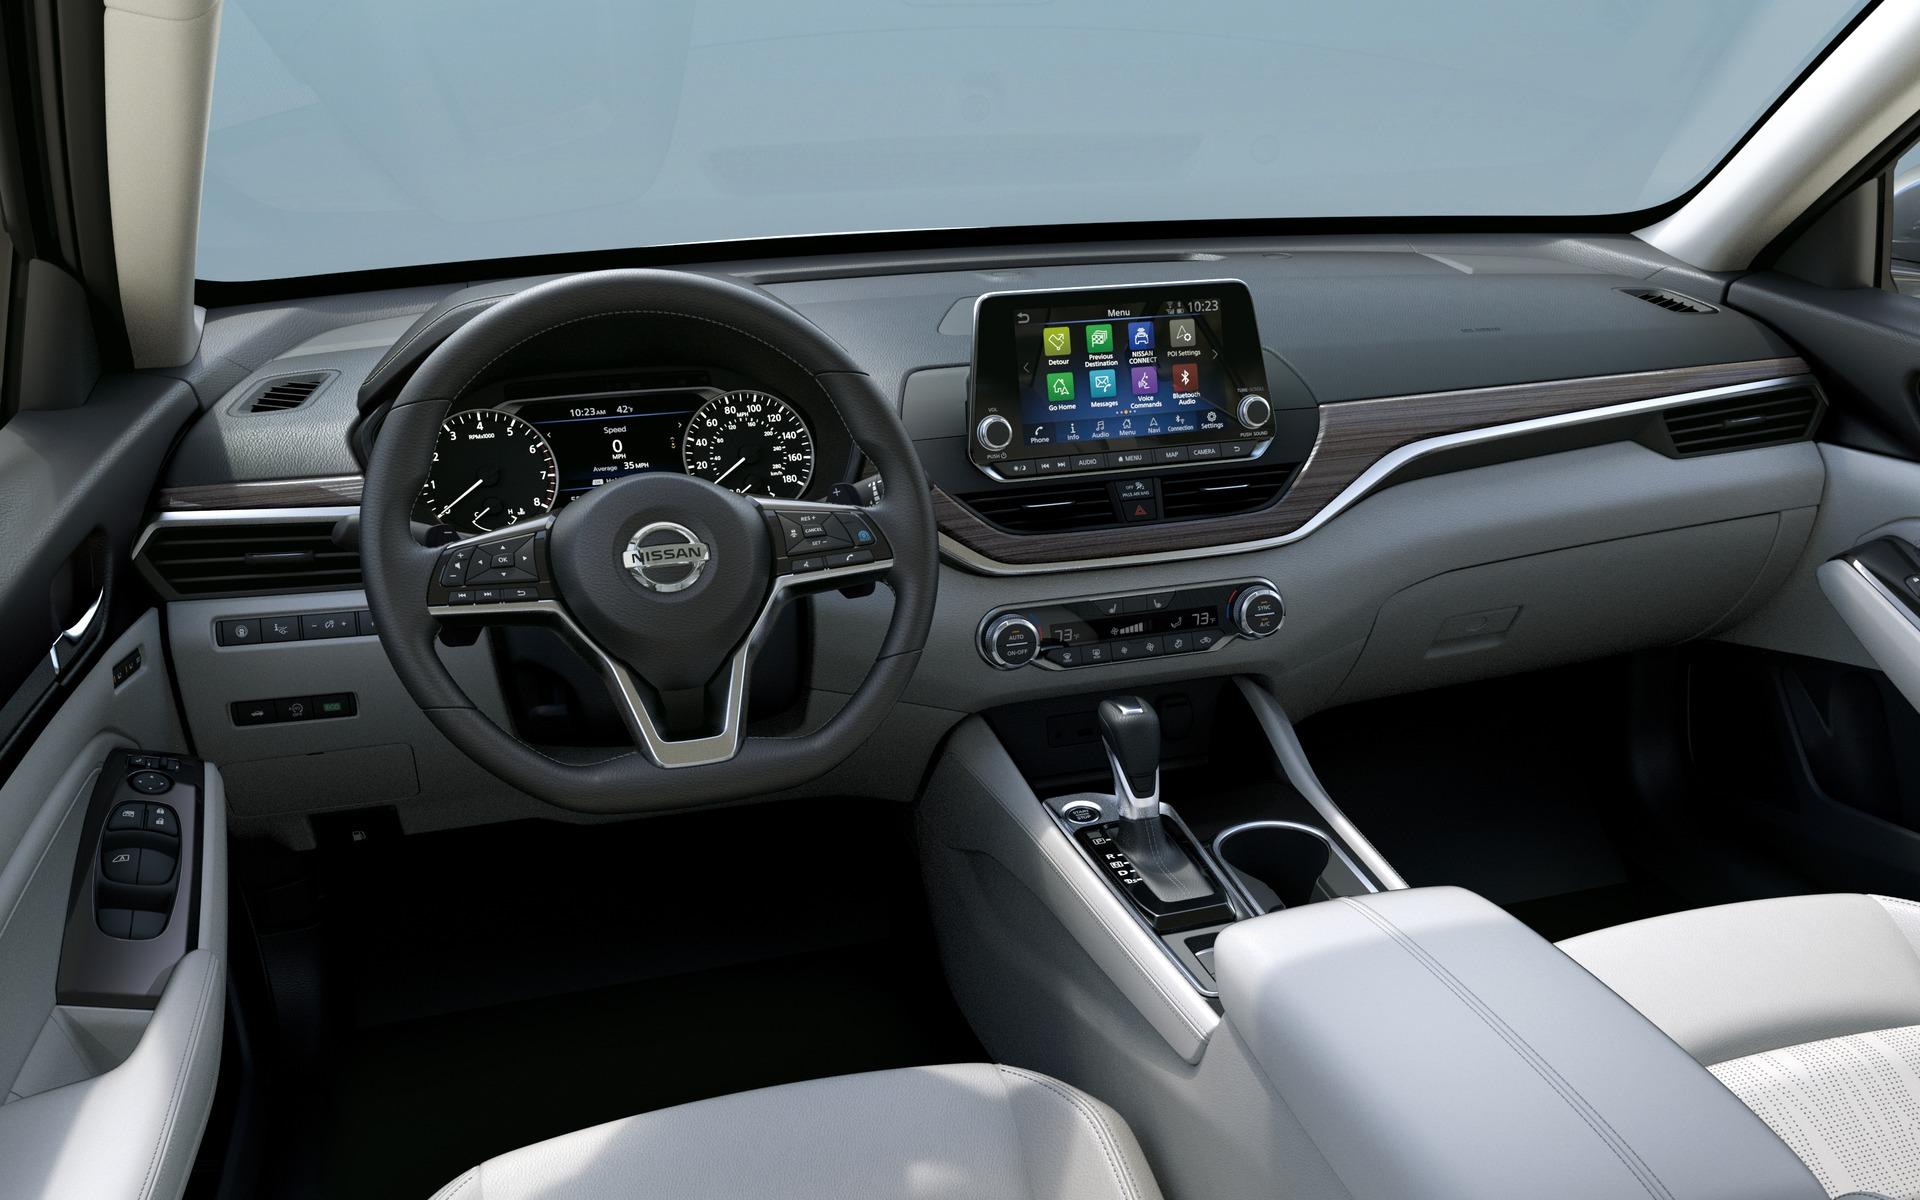 Nissan Altima 2019: enfin un moyen de se distinguer 350281_2019_Nissan_Altima